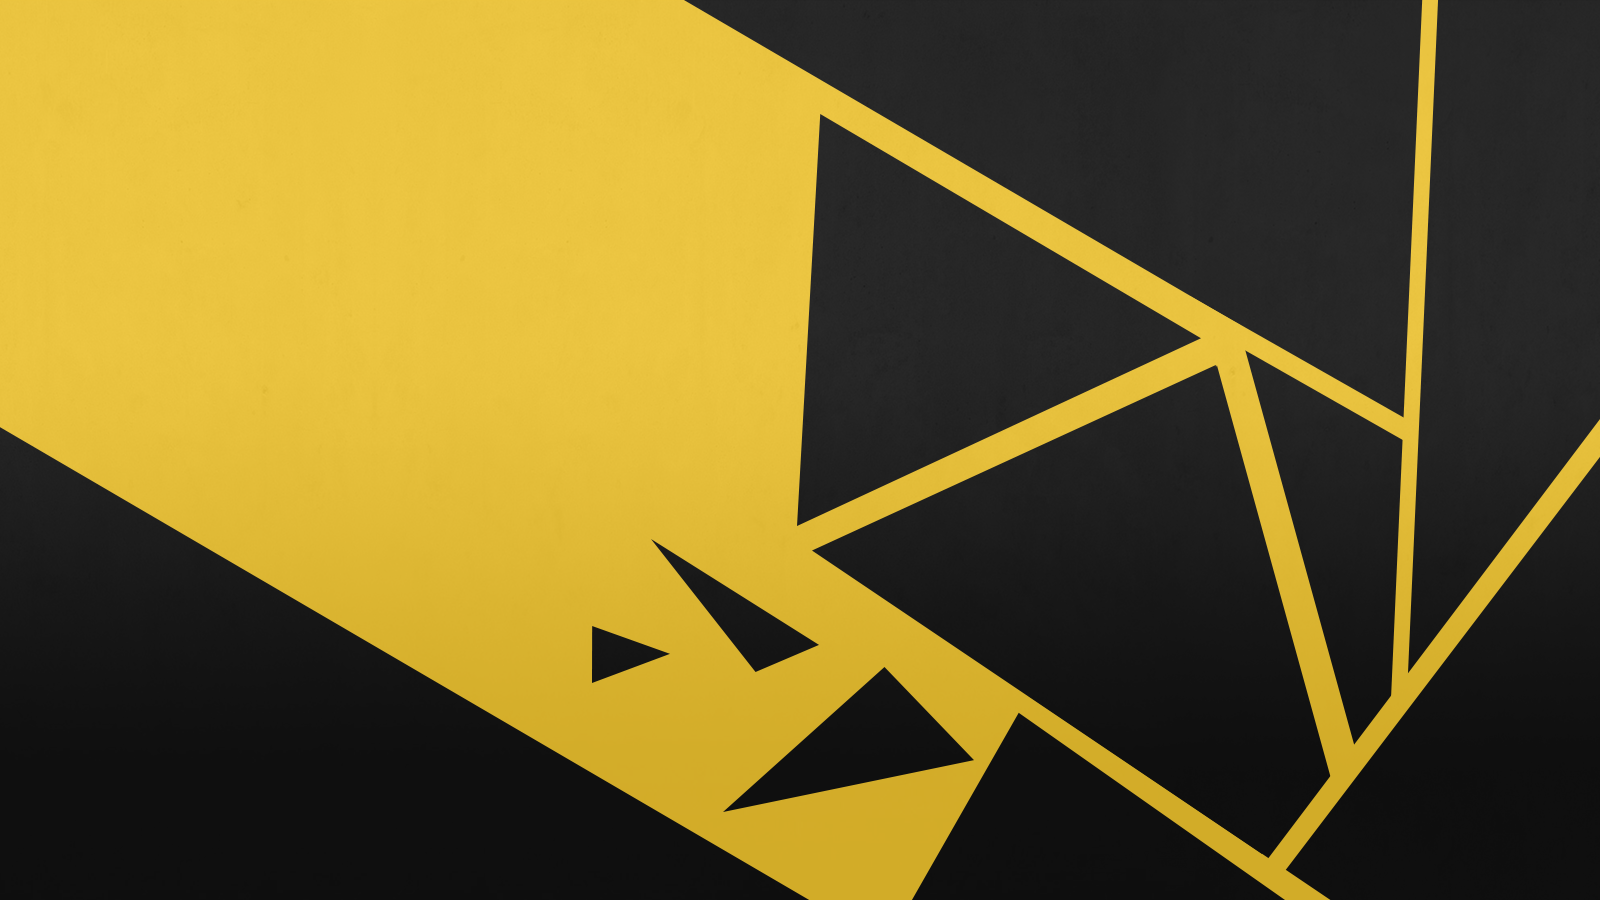 Geometric Patterns Deus Ex Iphone Background Vintage Wallpaper